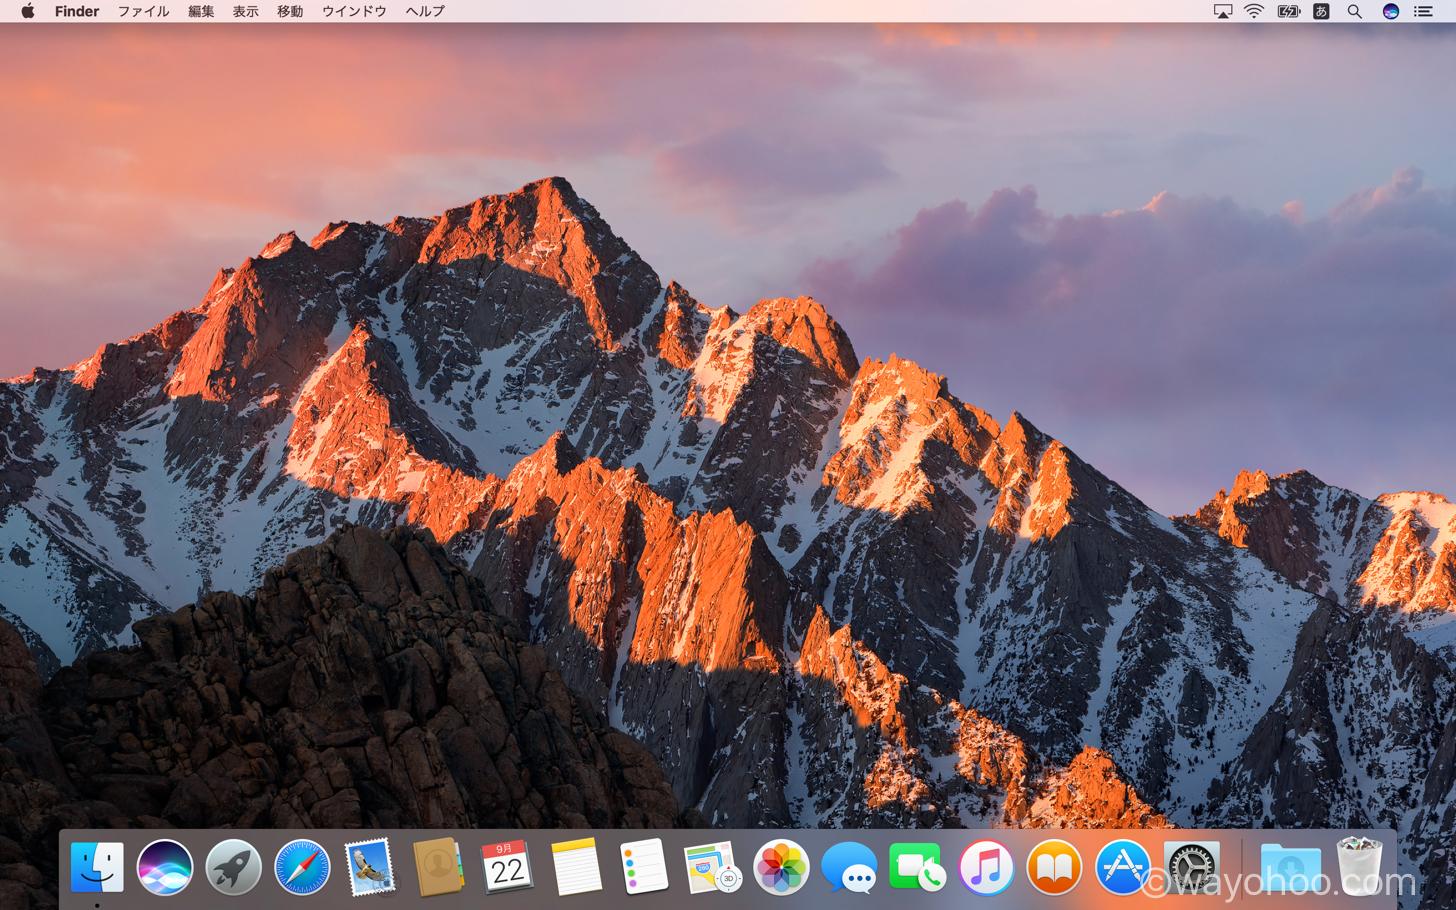 macOS Sierraのクリーンインストールが完了しました。